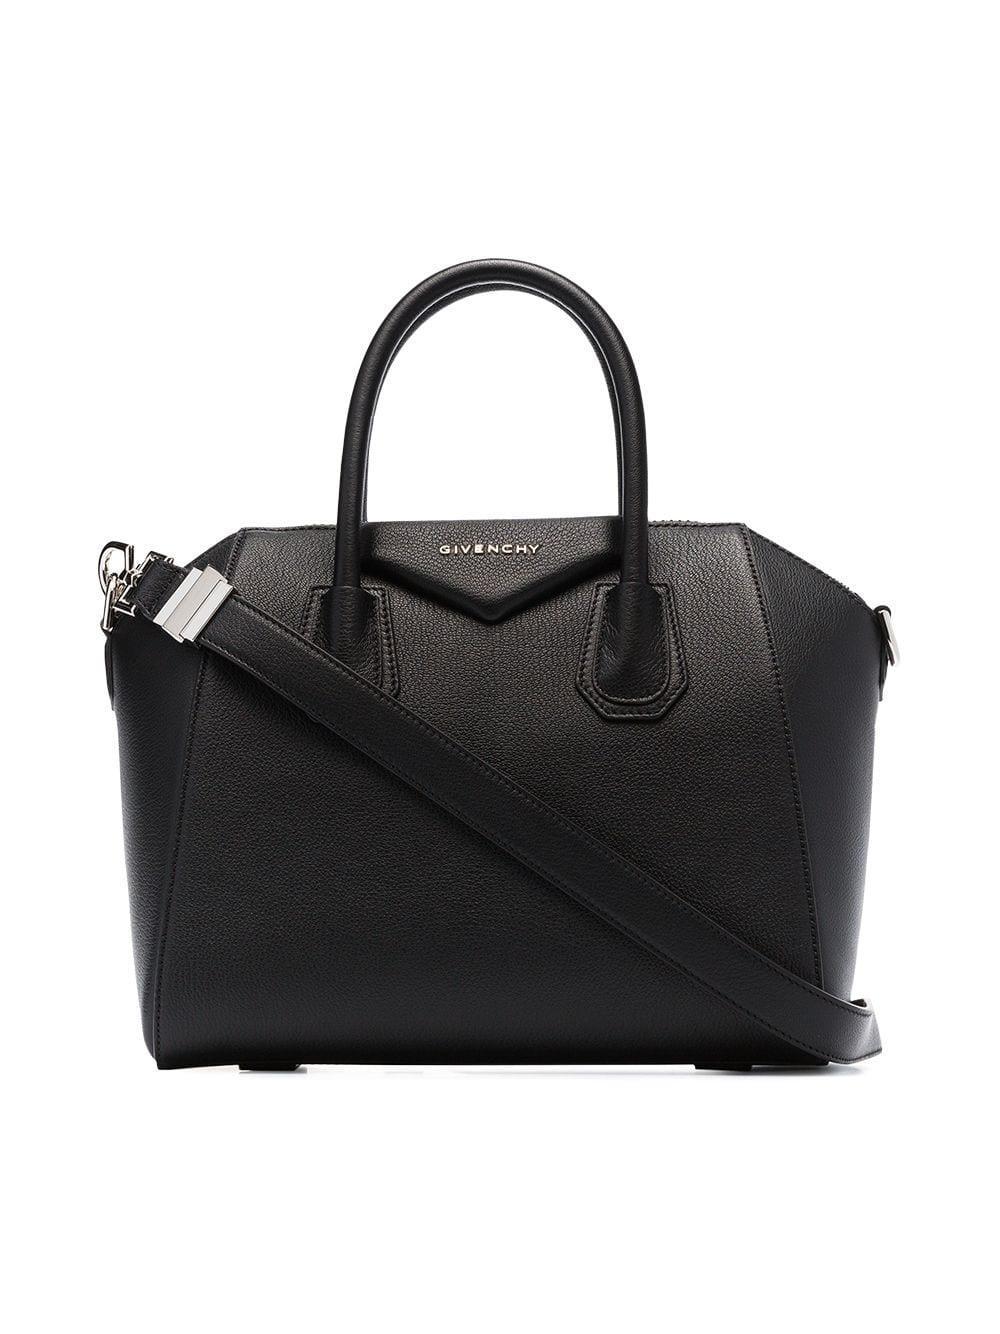 5e07060b24 Lyst - Givenchy Black Mini Antigona Bag in Black - Save 32%